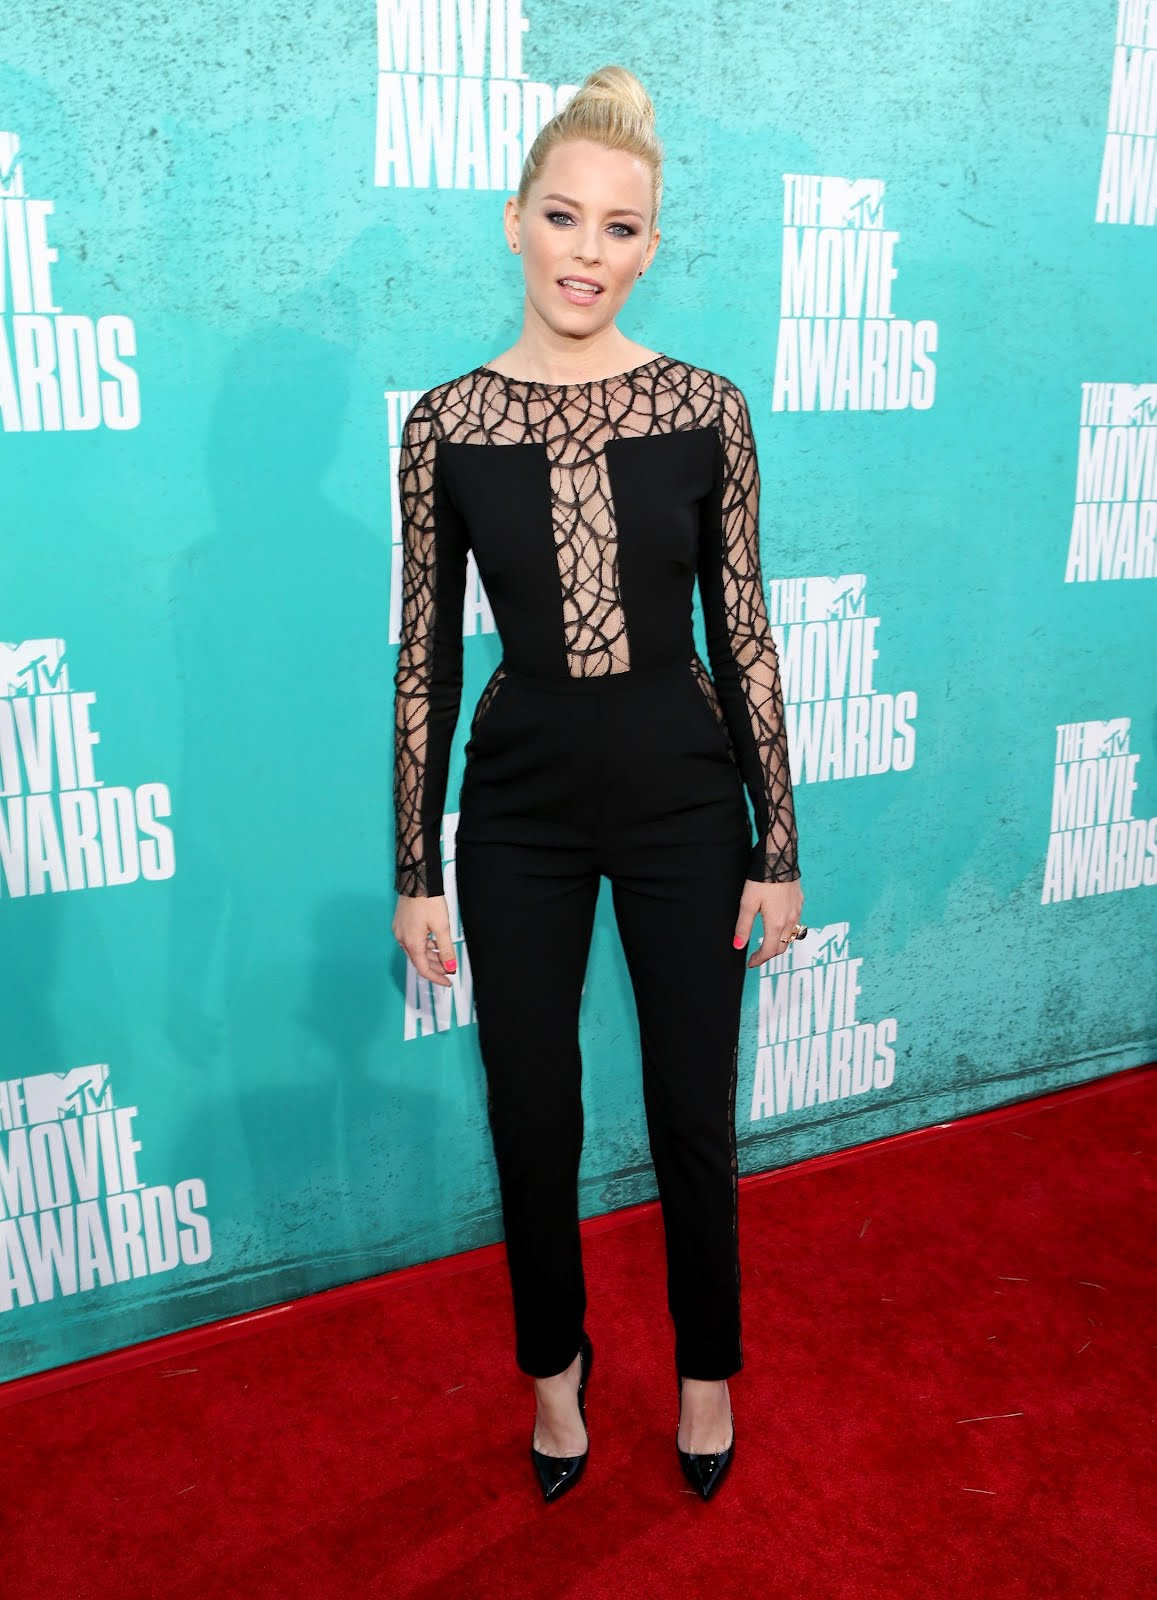 Cassidy Banks Blue Dress